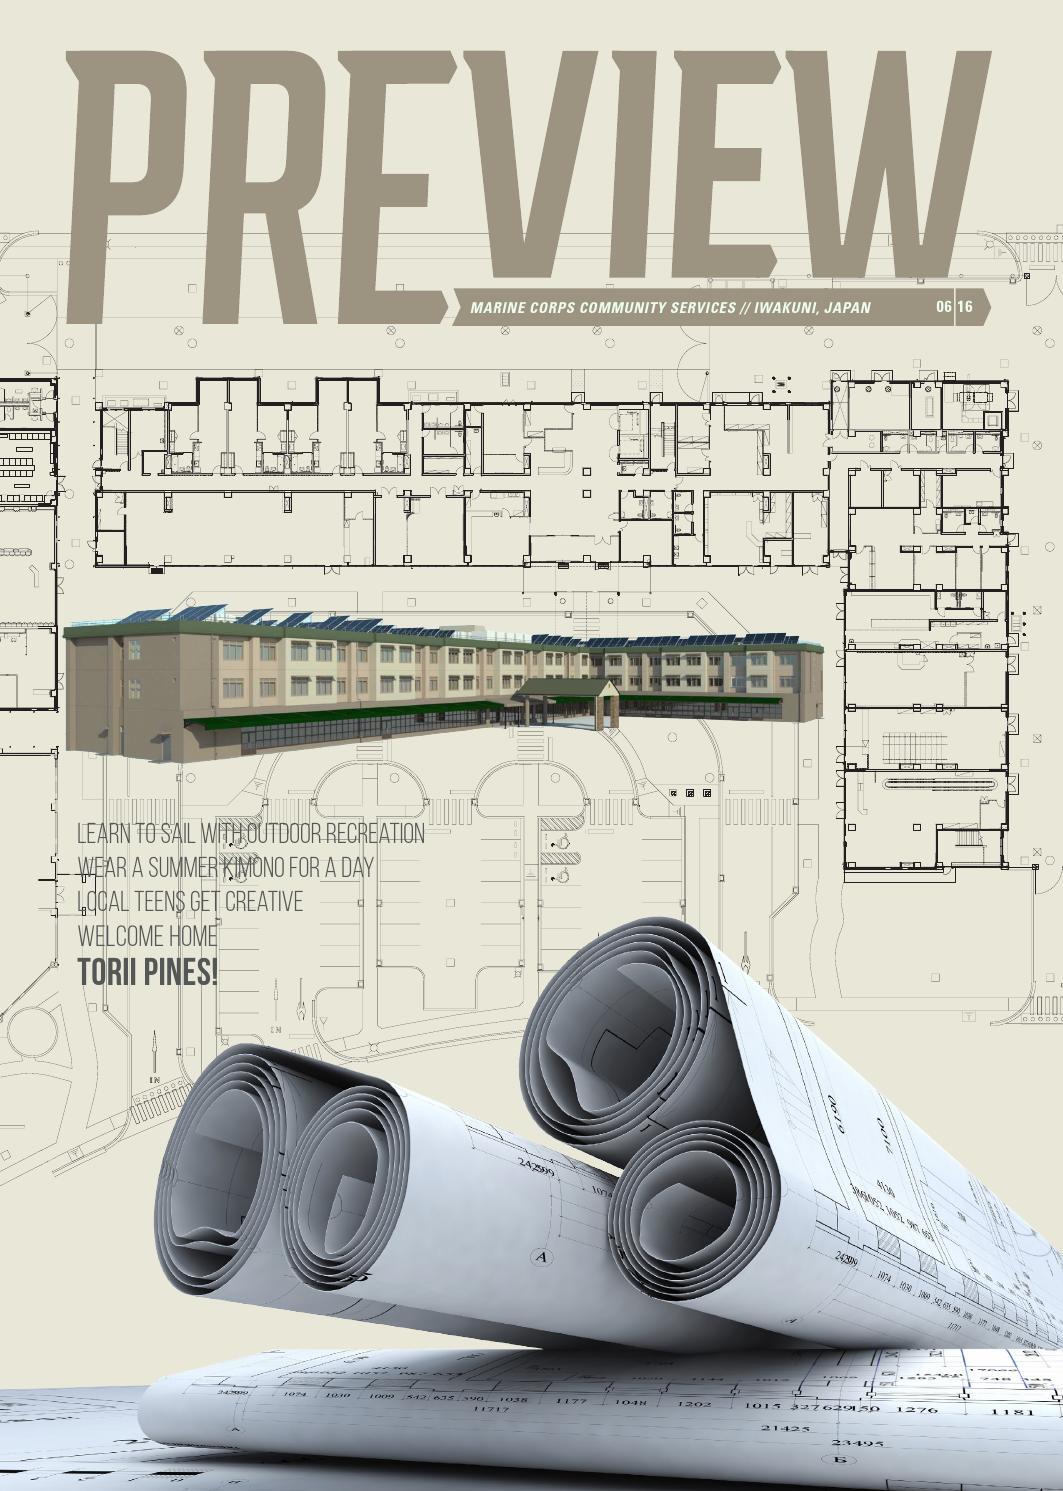 Preview Magazine - June 2016 by MCCS Iwakuni - issuu